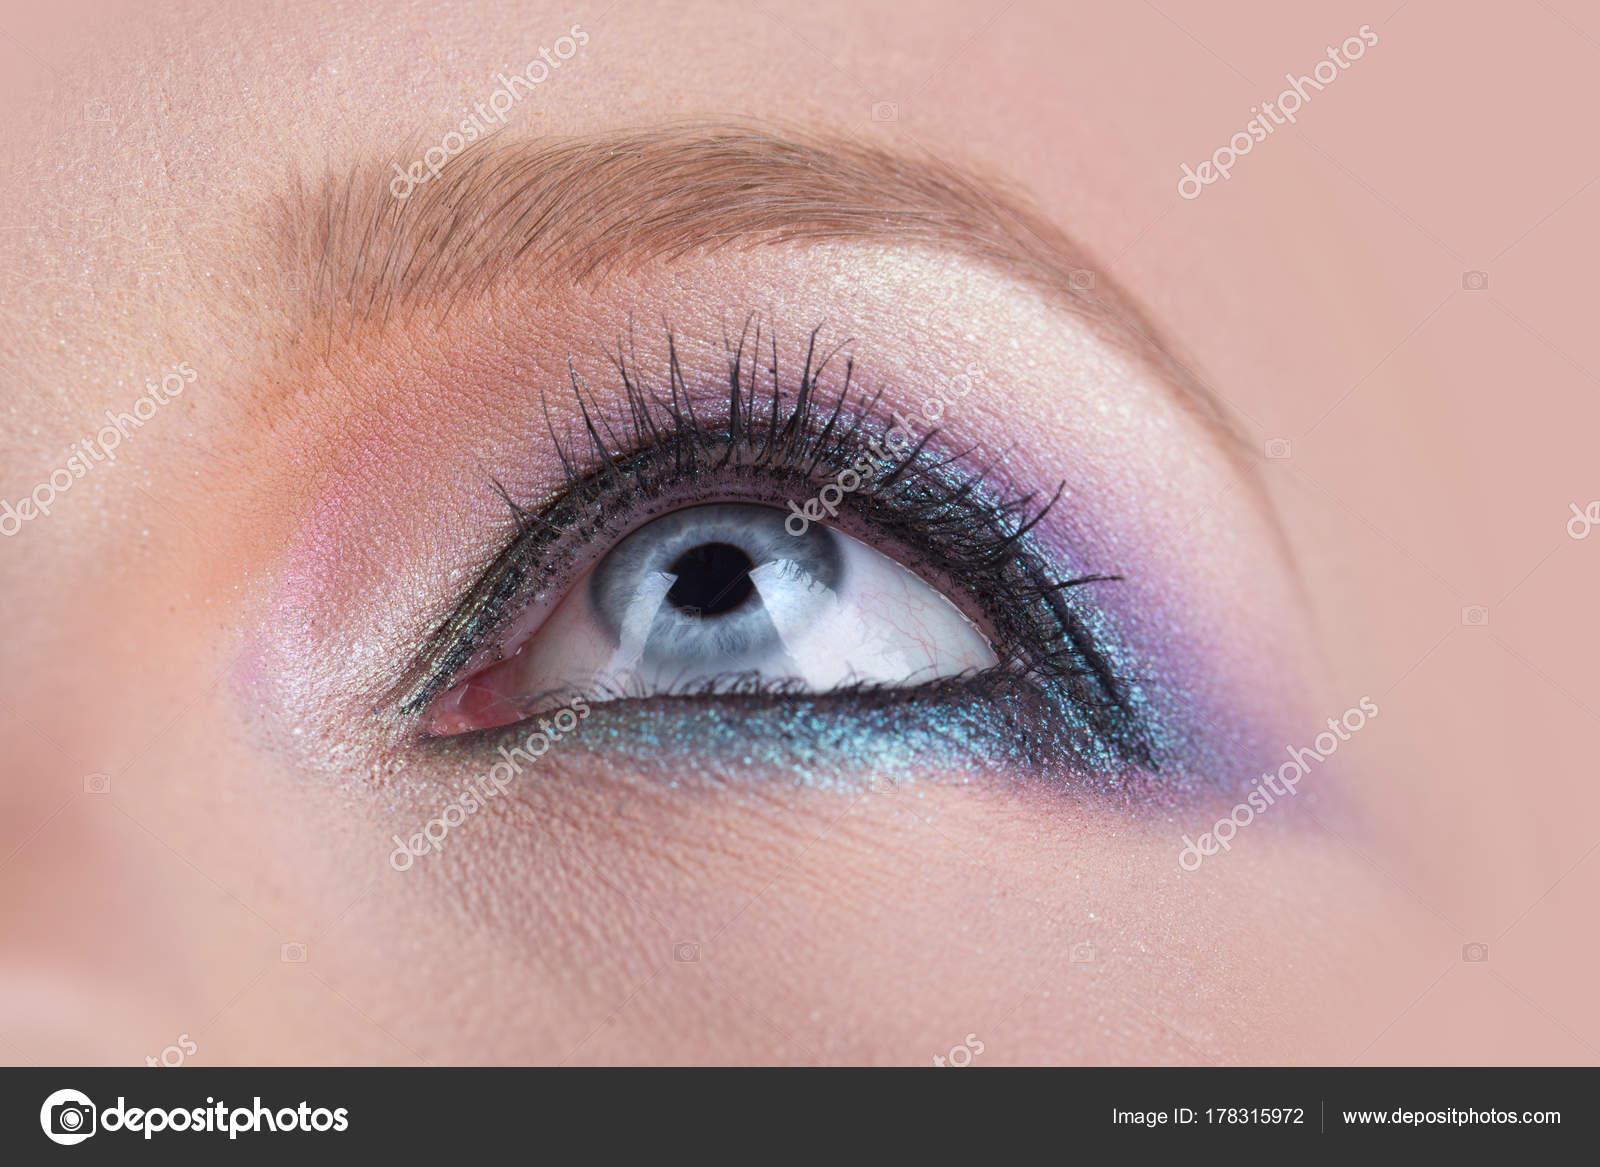 Blaue Augen Rosa Bunten Make Up Nahaufnahme Makro Schöne Frauen